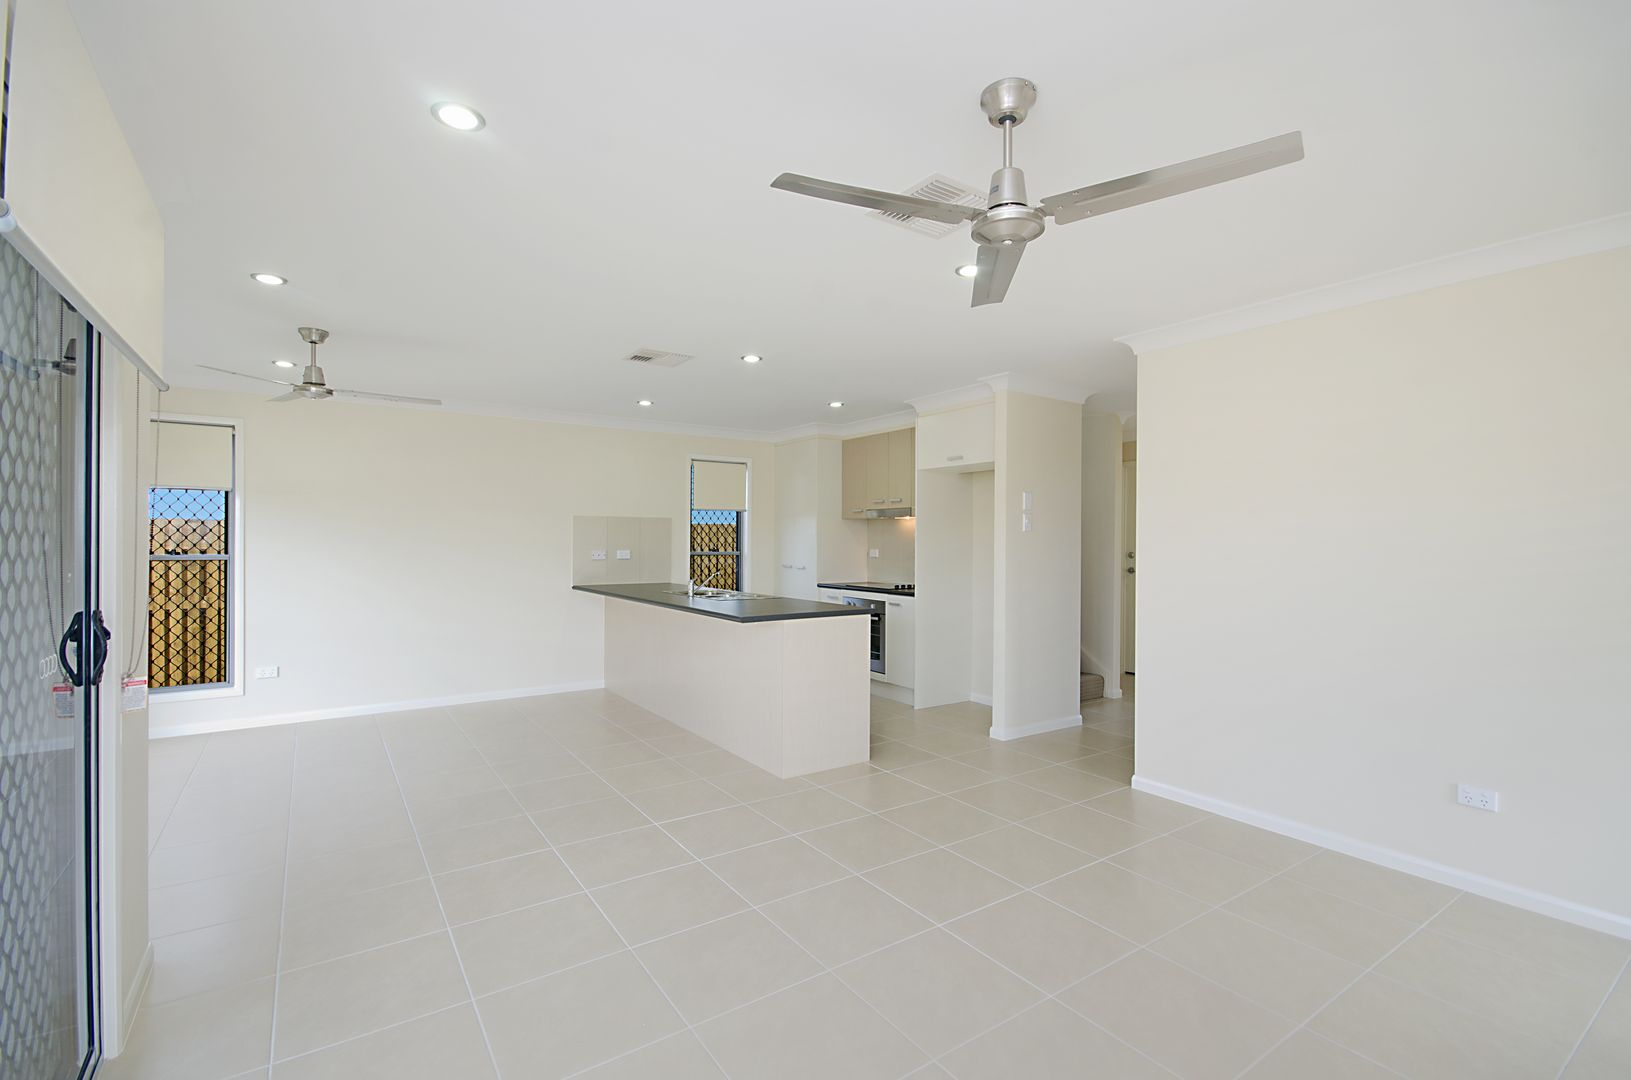 2/10 Brooke Lane, Burdell QLD 4818, Image 1